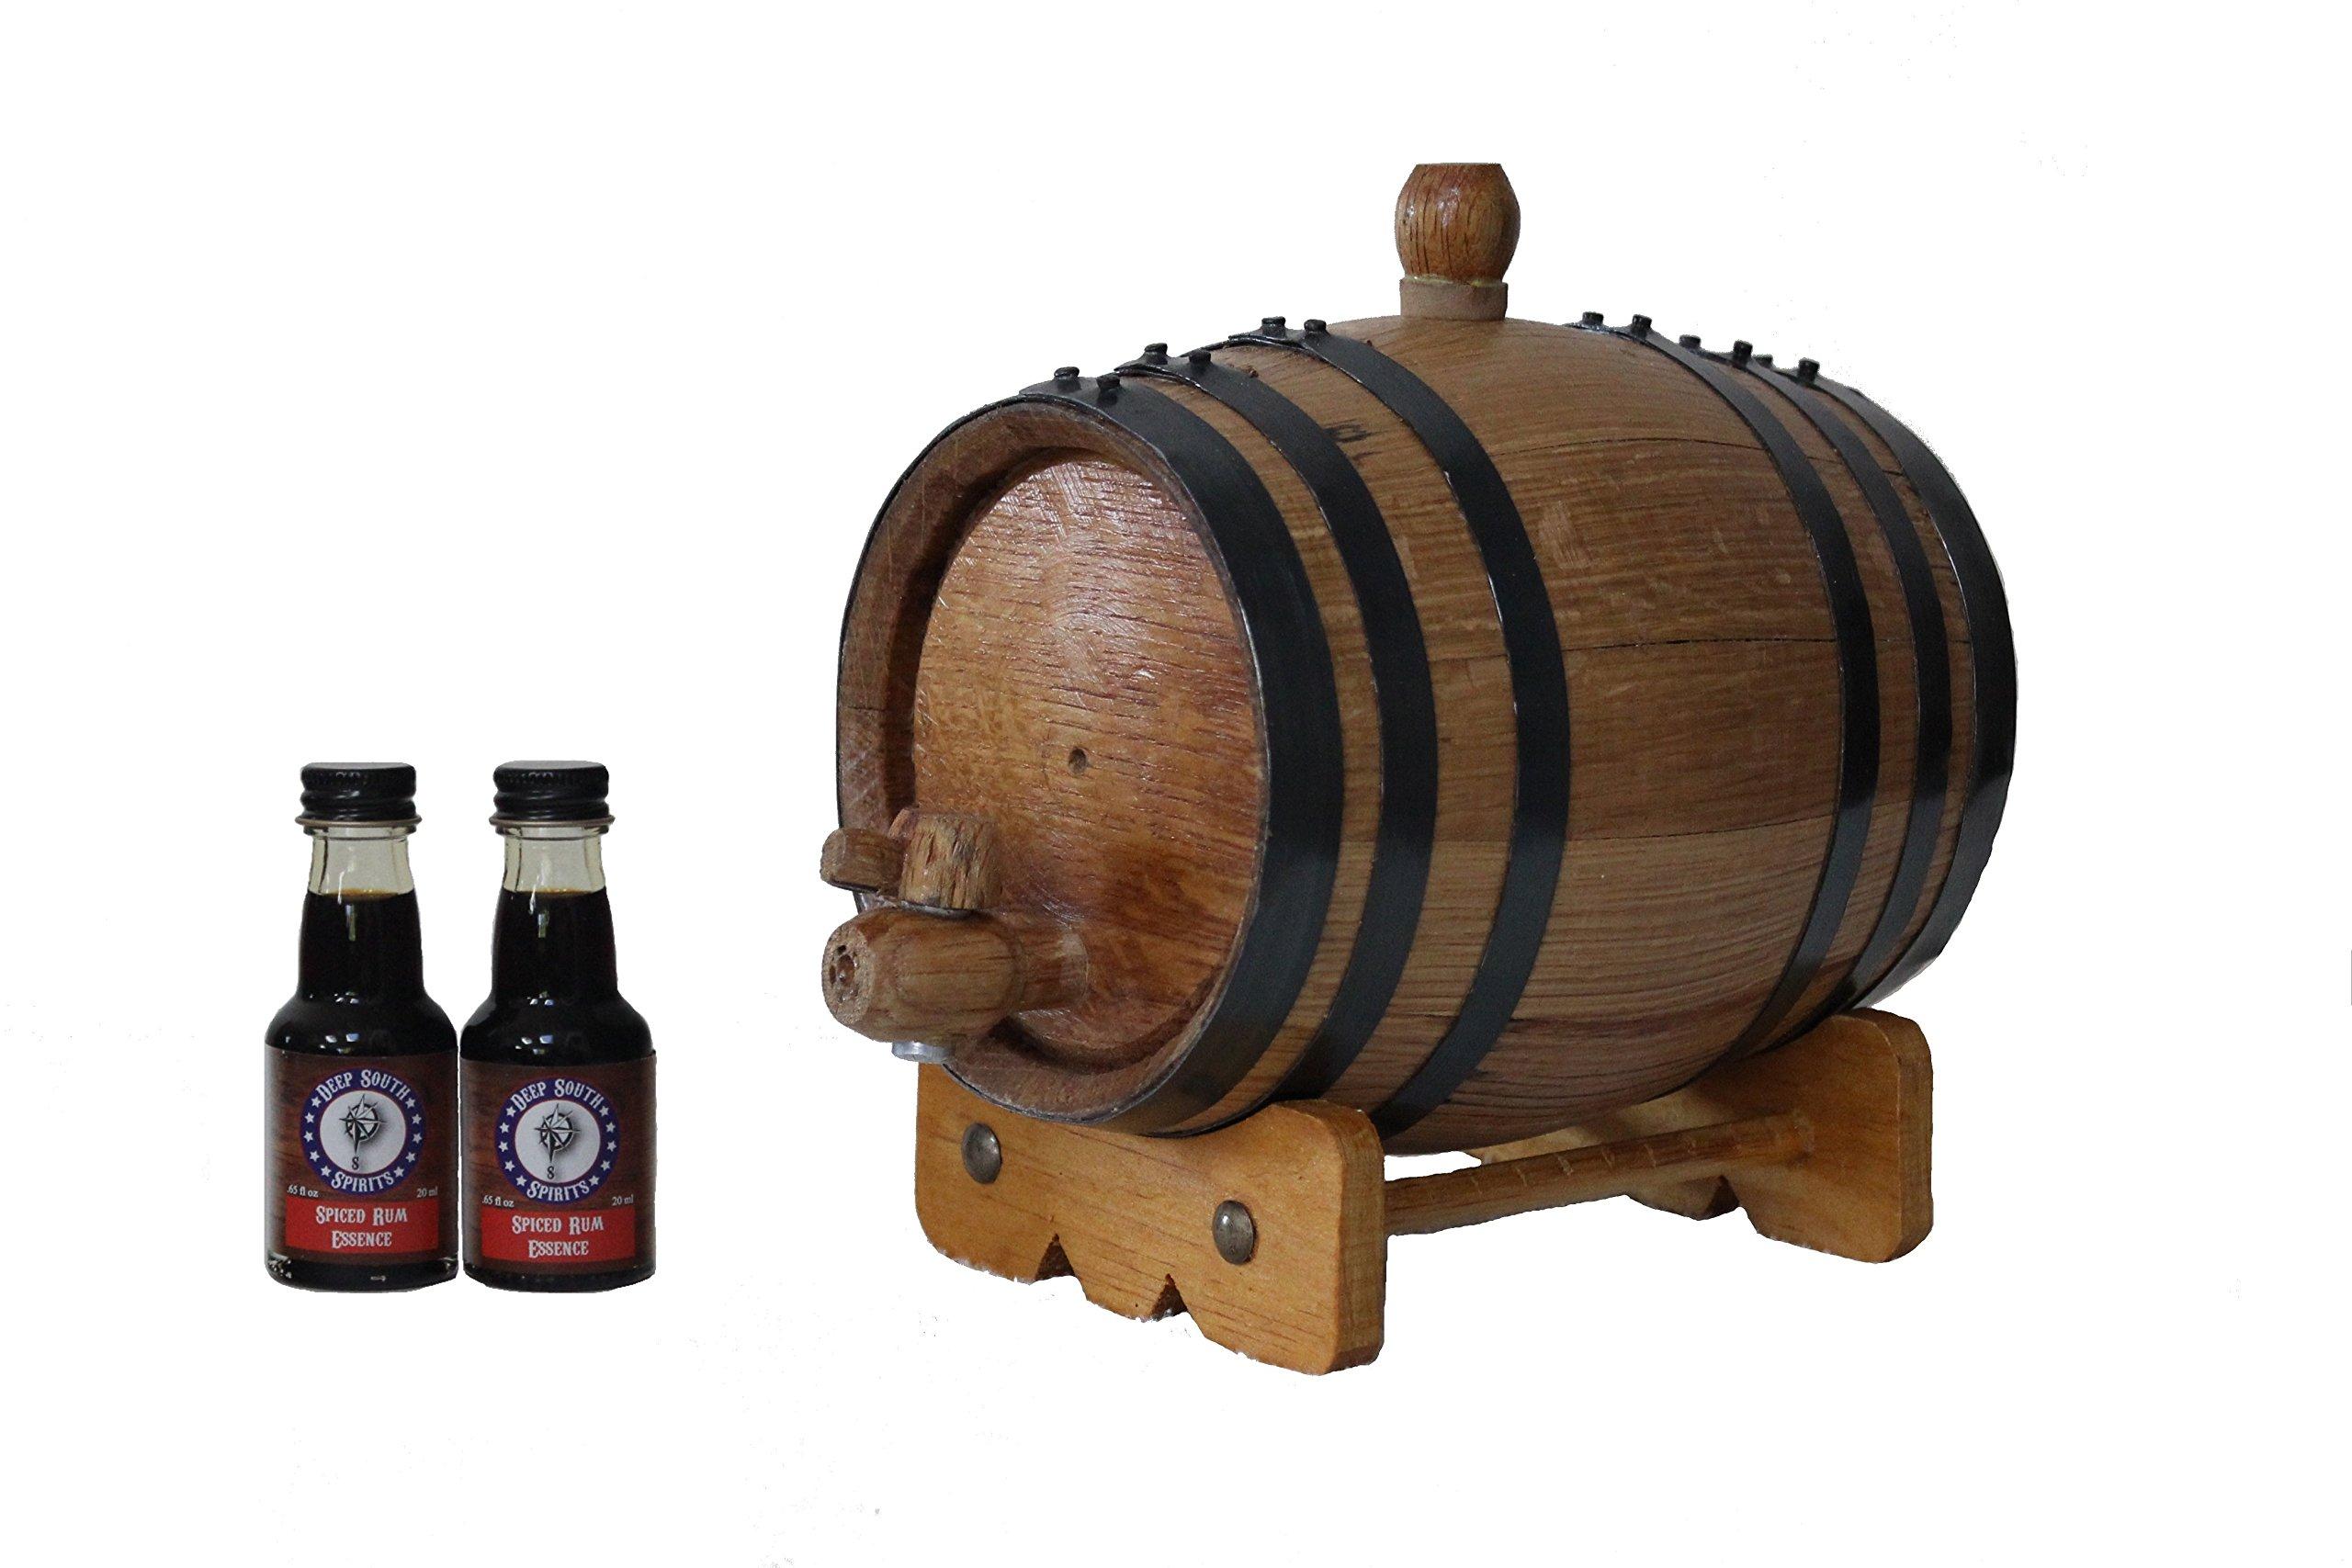 Deep South Barrels 1-Liter American White Oak Barrel Spiced Rum Kit